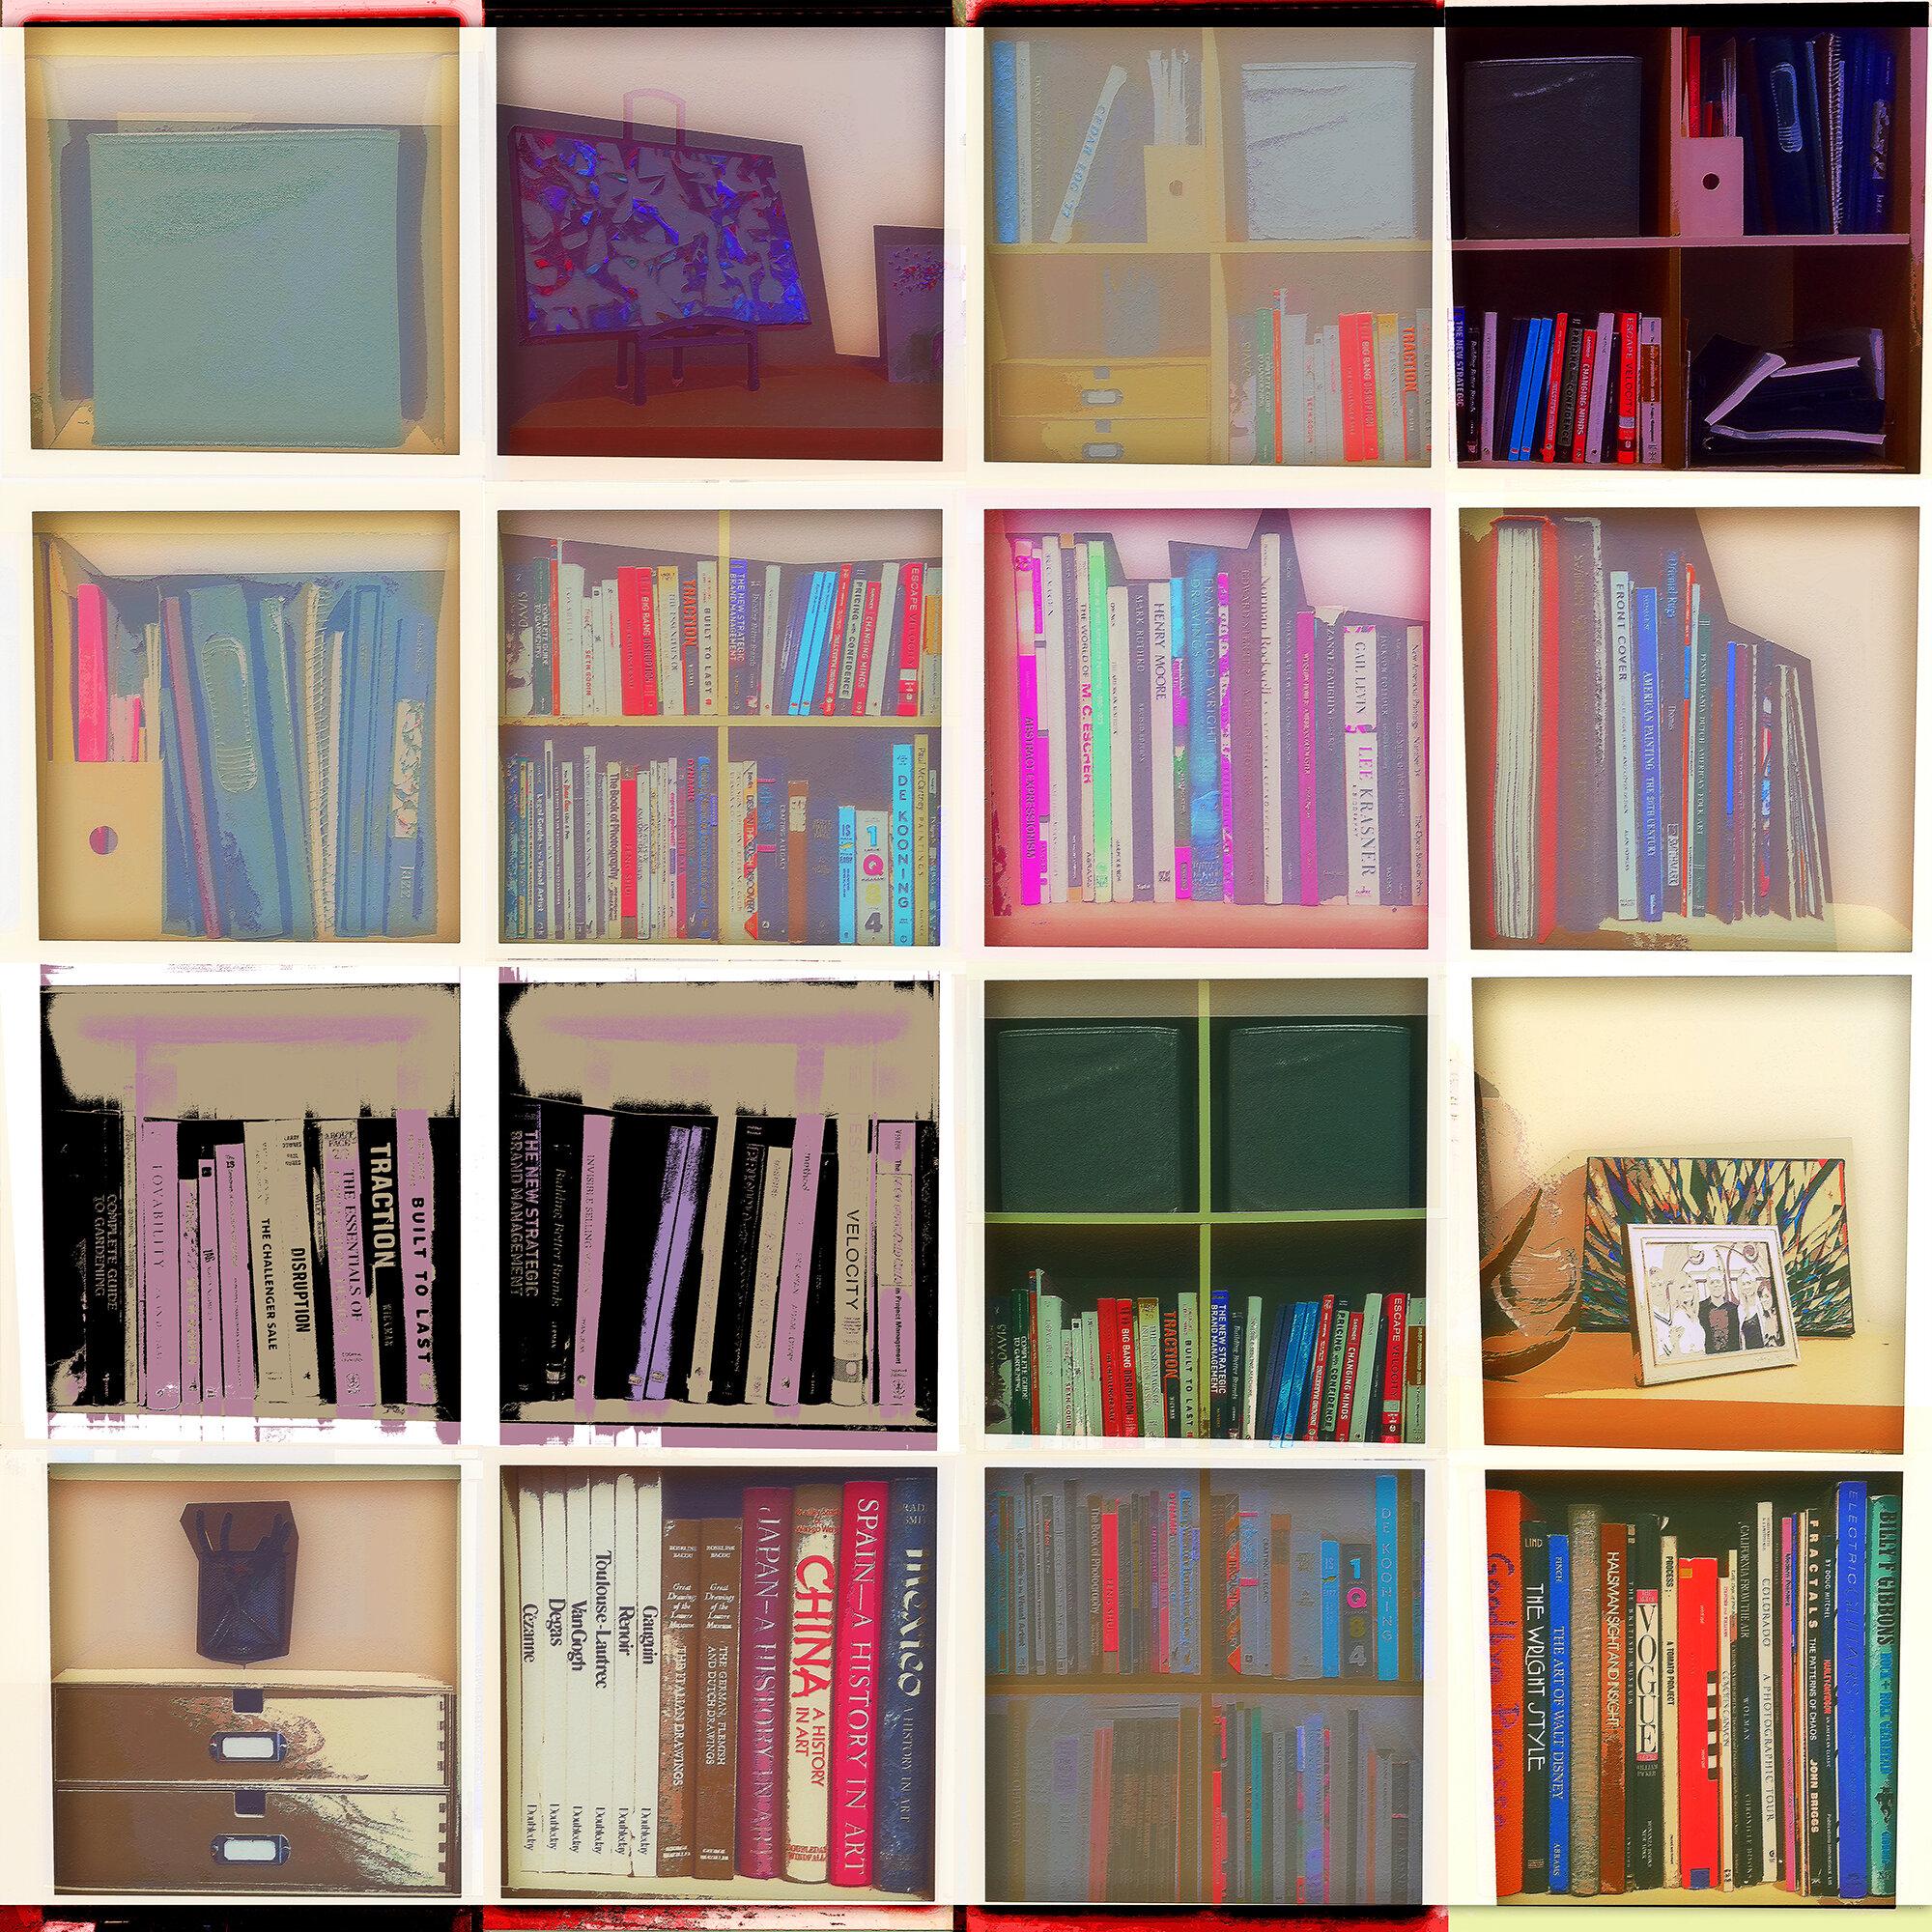 190914 Bookshelf4